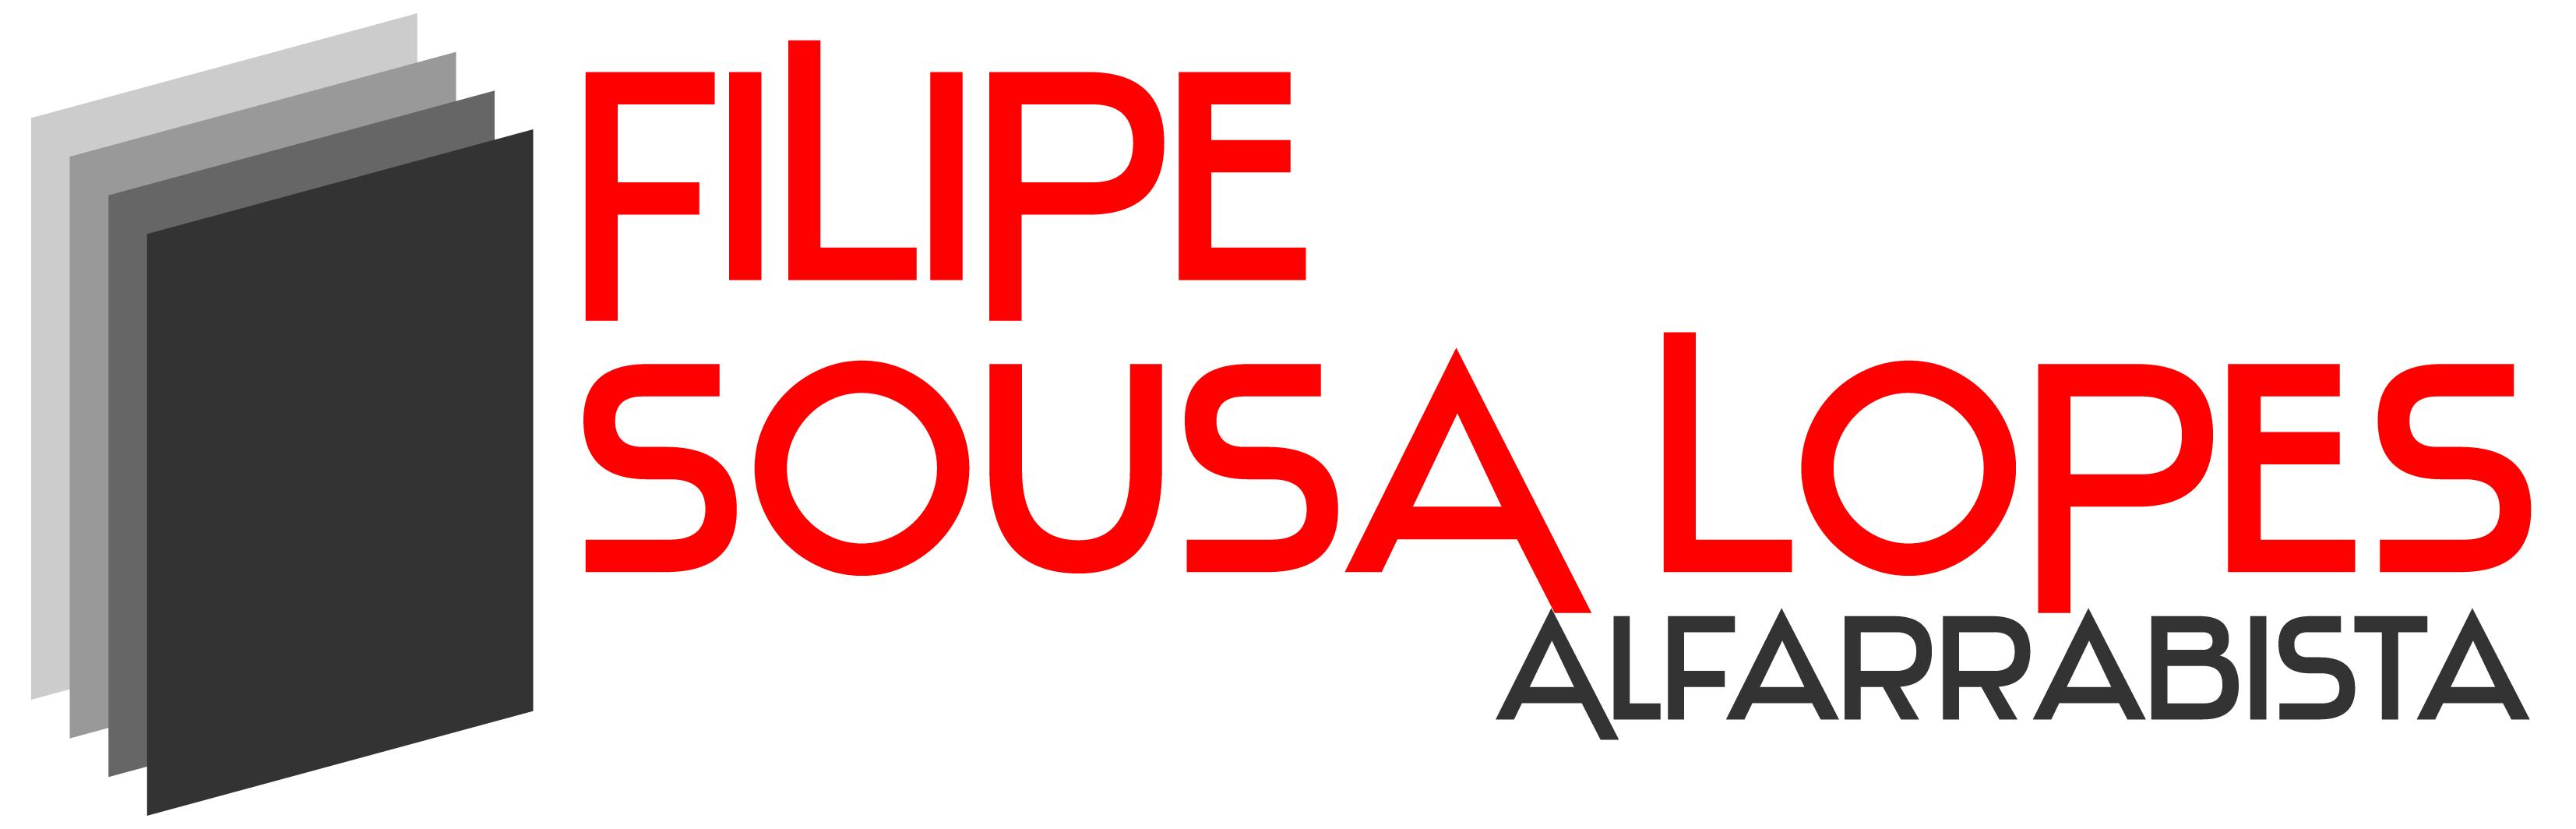 Filipe Sousa Lopes - Alfarrabista